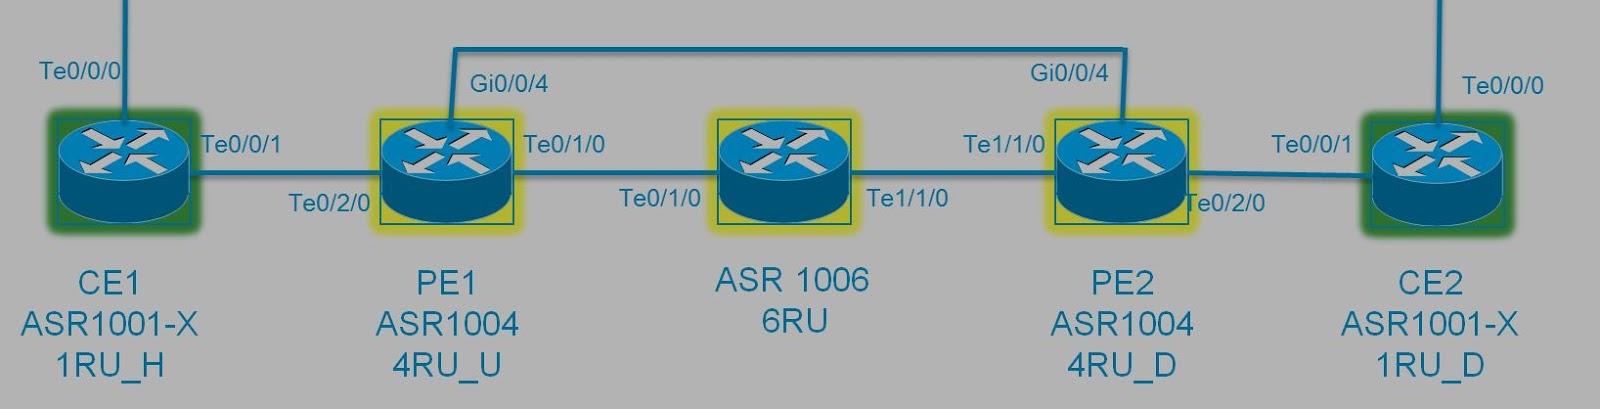 HACK BLOG: MacSec over OTV (on VxLAN) + QoS